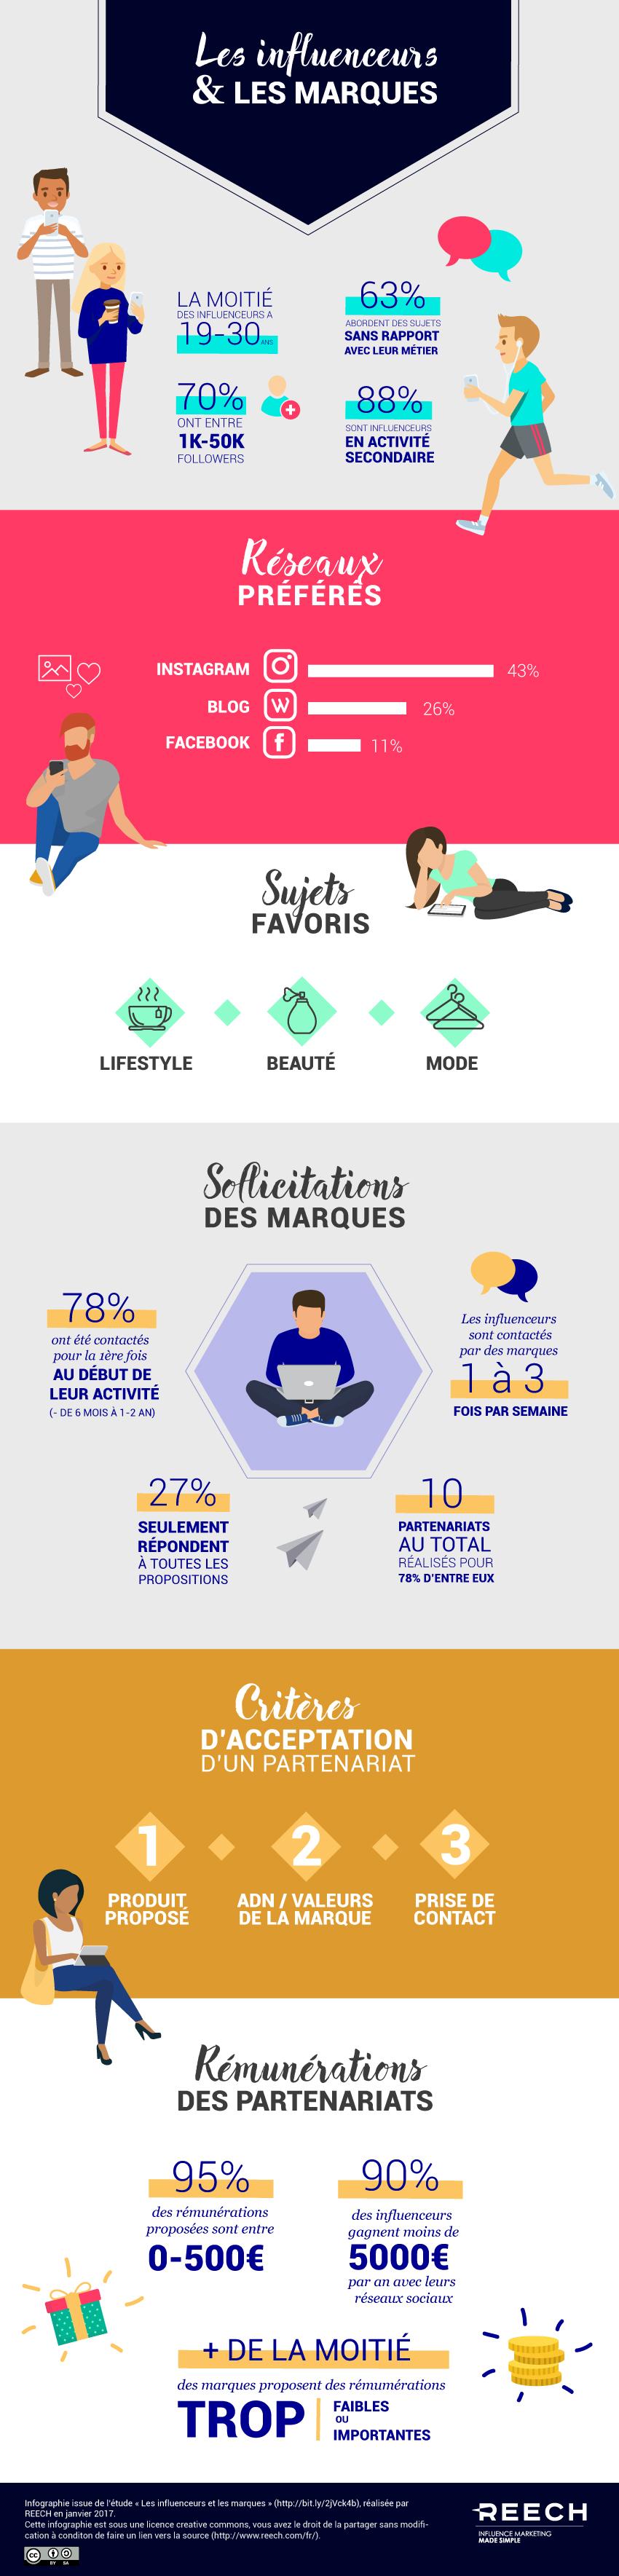 infographie reech influenceurs marques